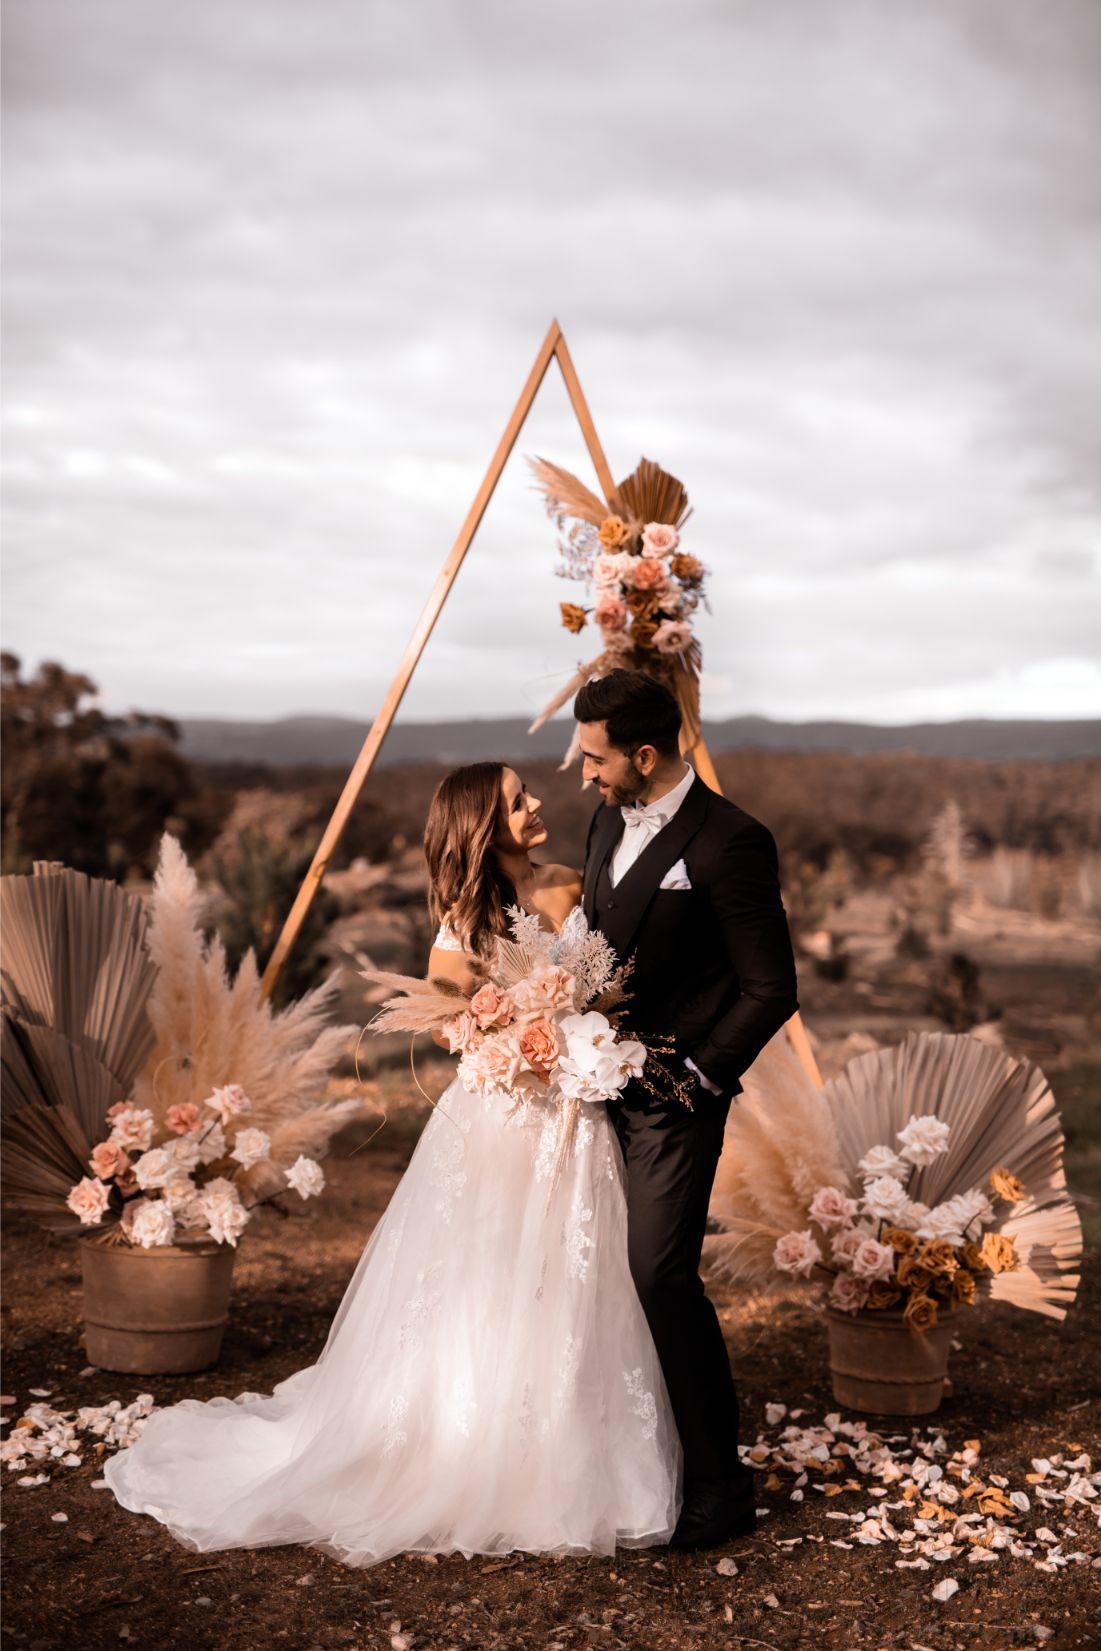 STYLED SHOOT: LUXE BOHEMIAN BLISS   ELOPEMENT WEDDING SHOOT ADELAIDE SA